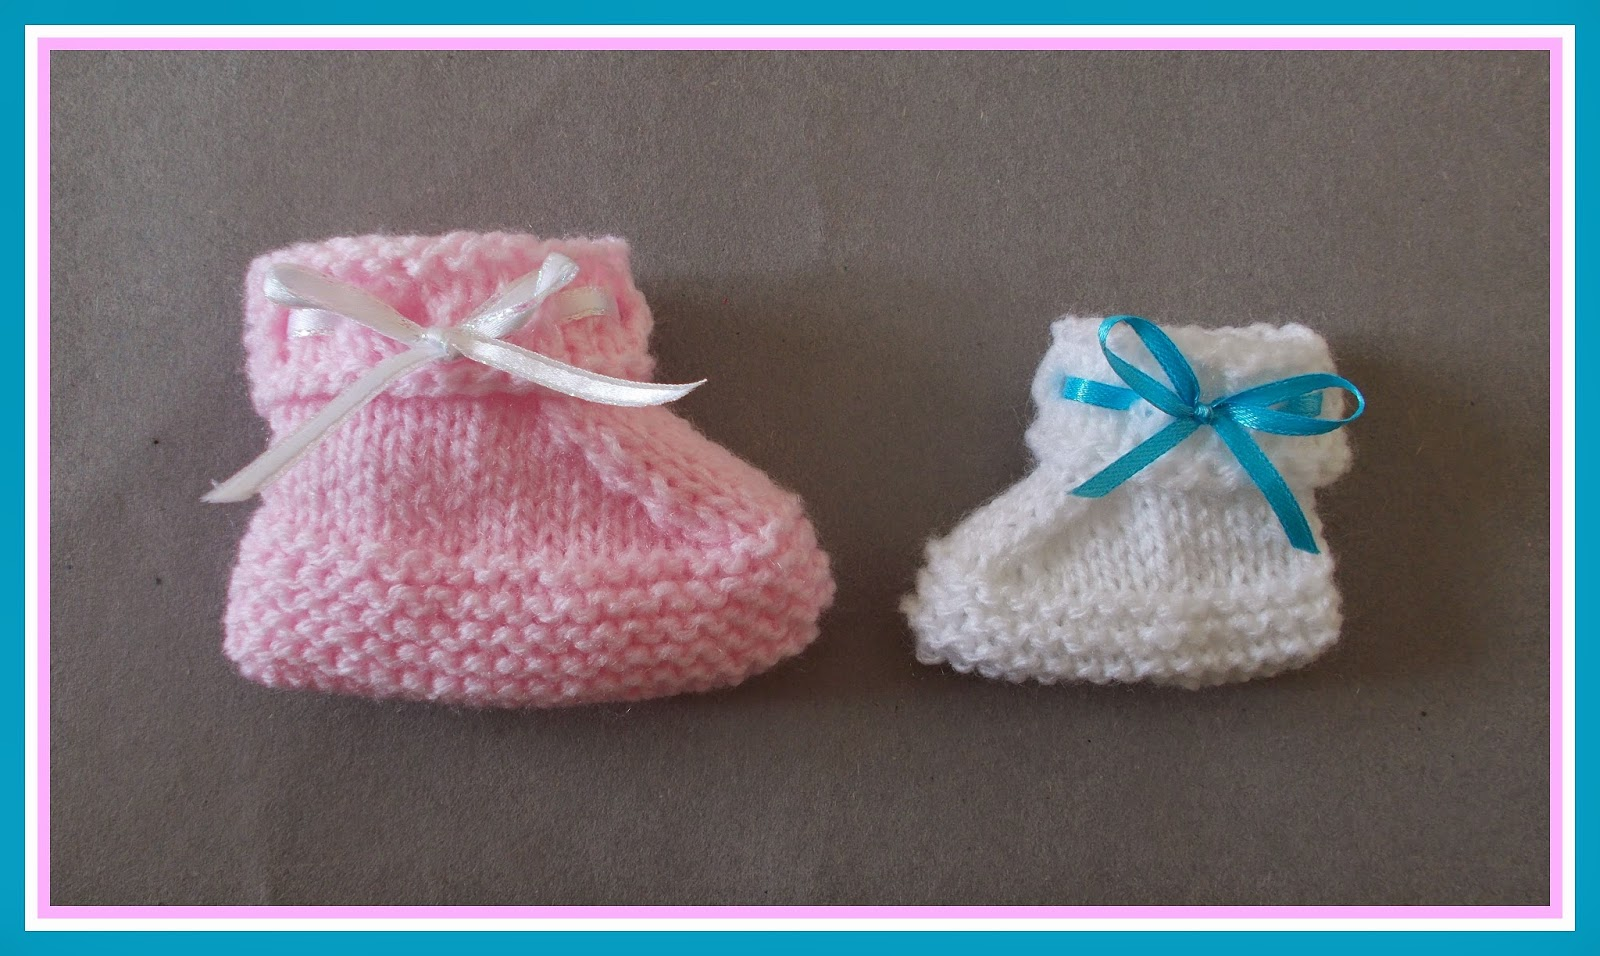 Knitting Yrn P2tog : Marianna s lazy daisy days ribbon bow booties